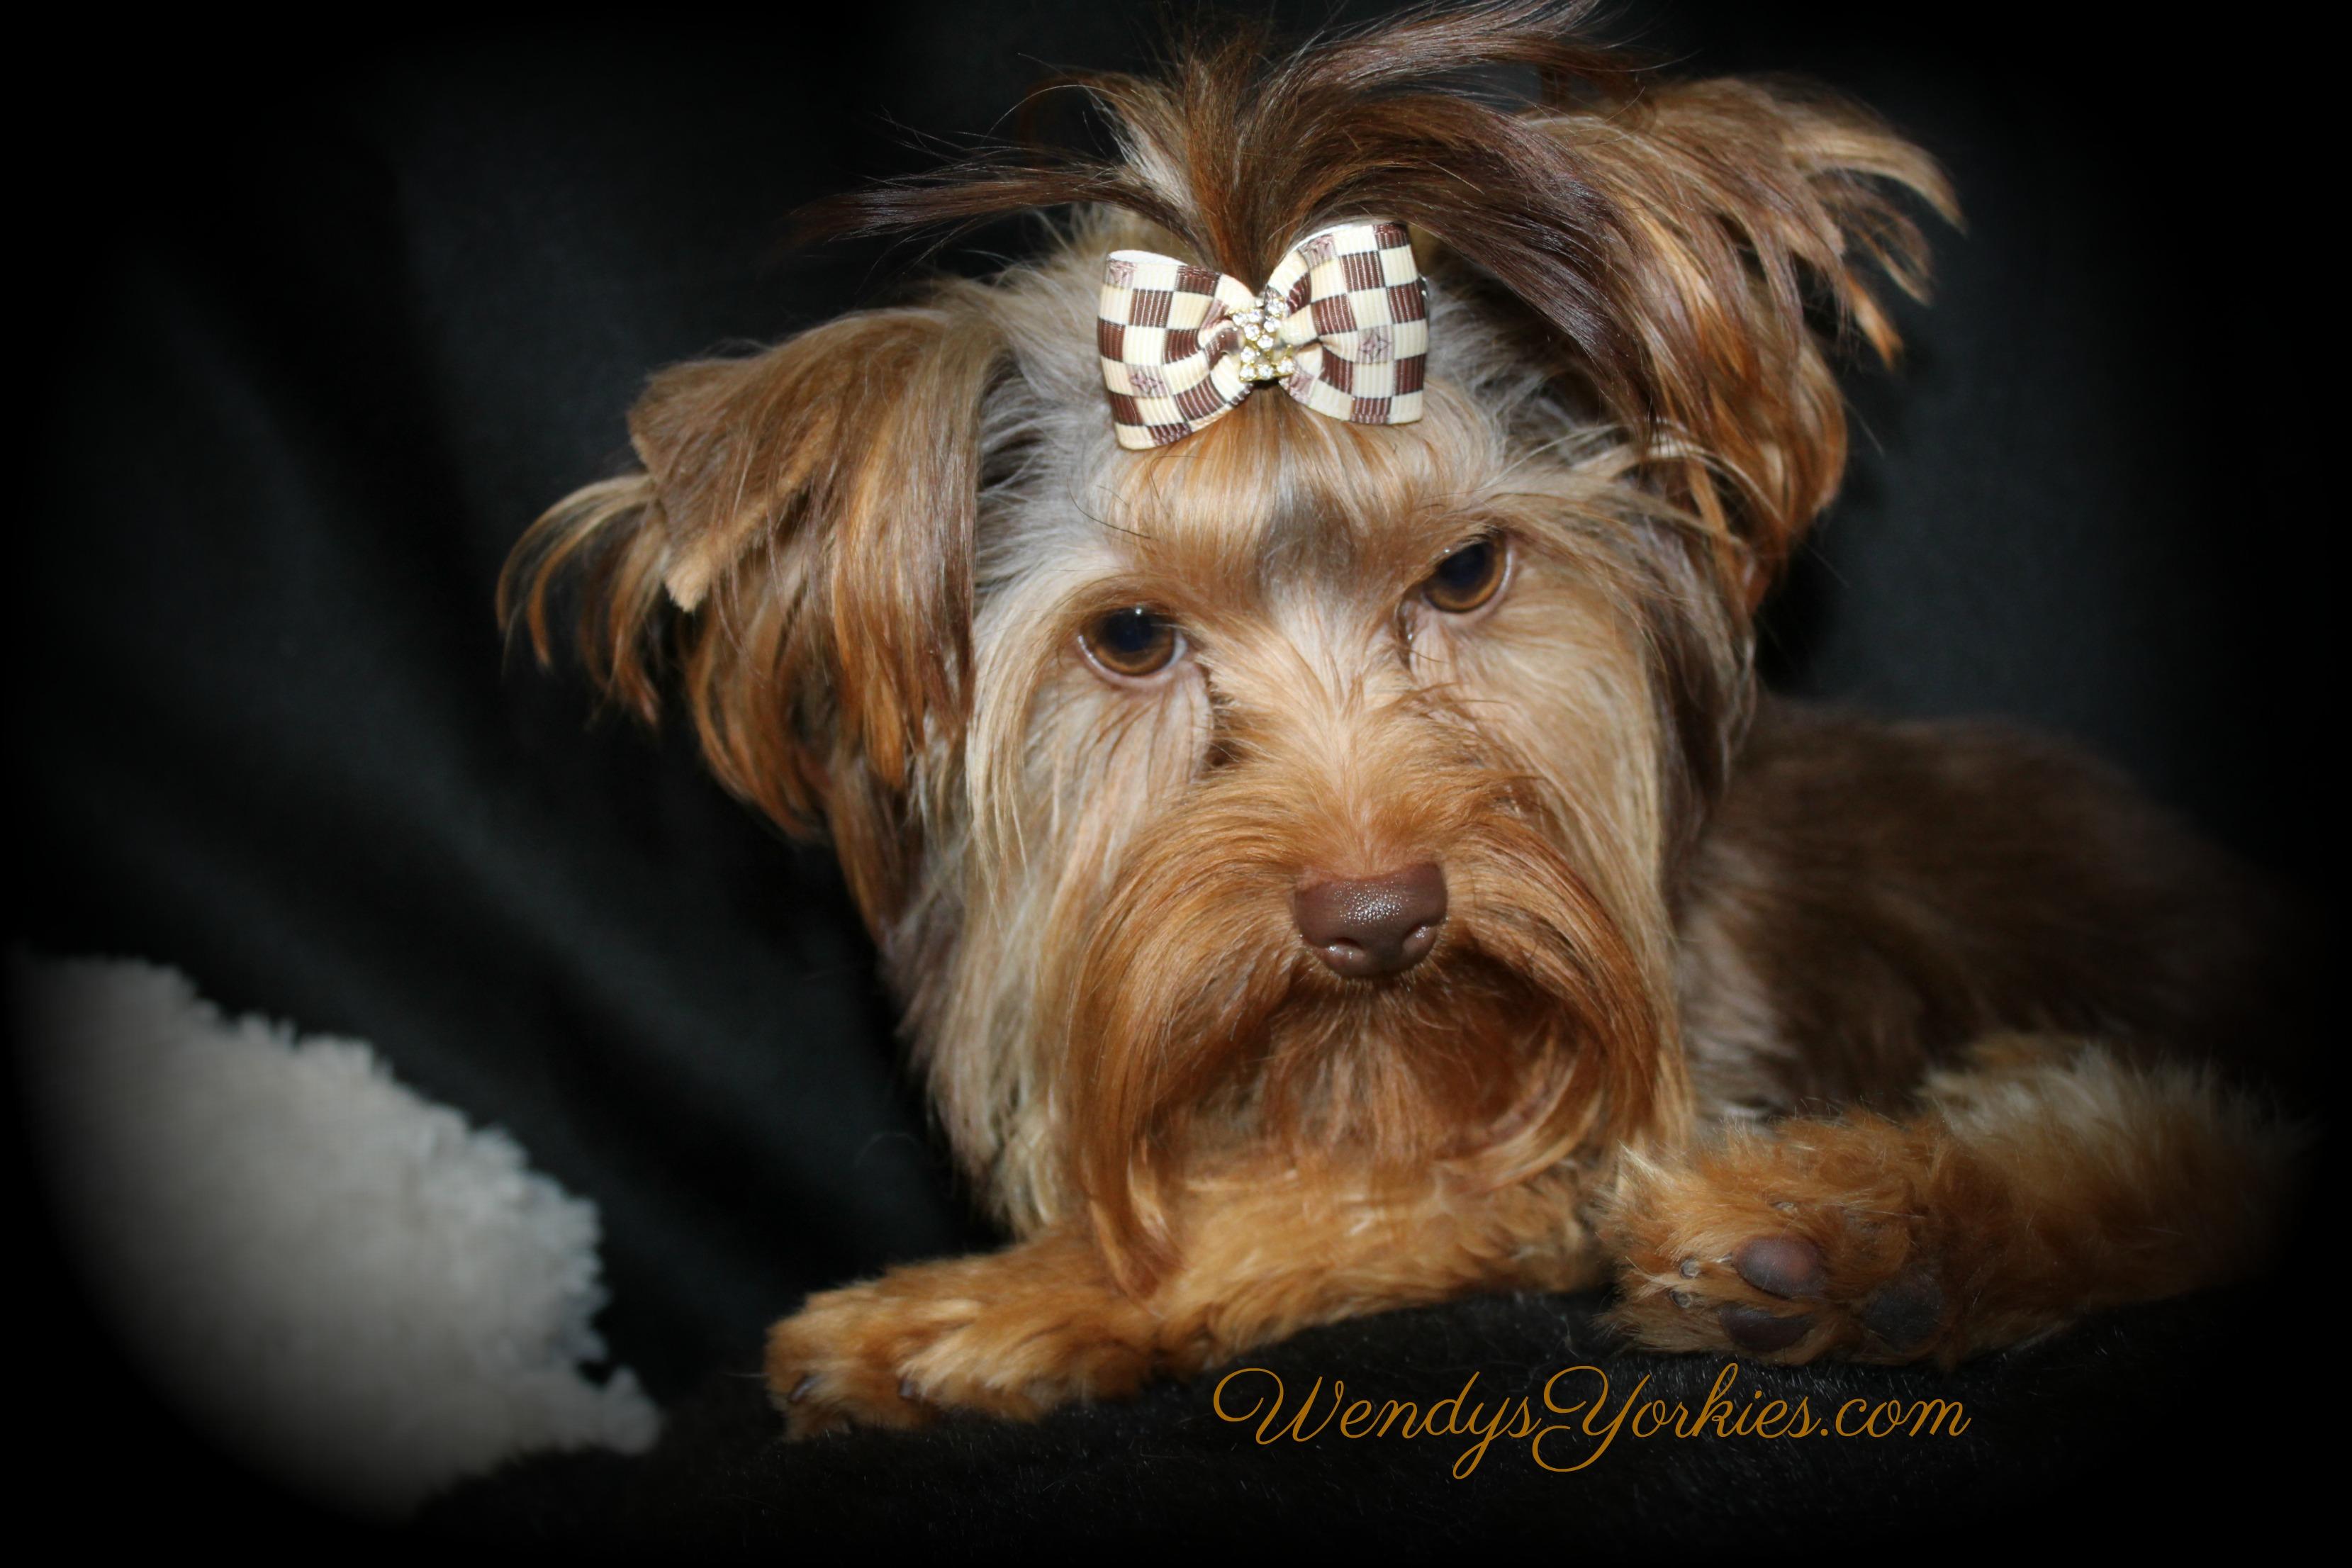 Tec, Chocolate Yorkie puppy for sale, WendysYorkies.com